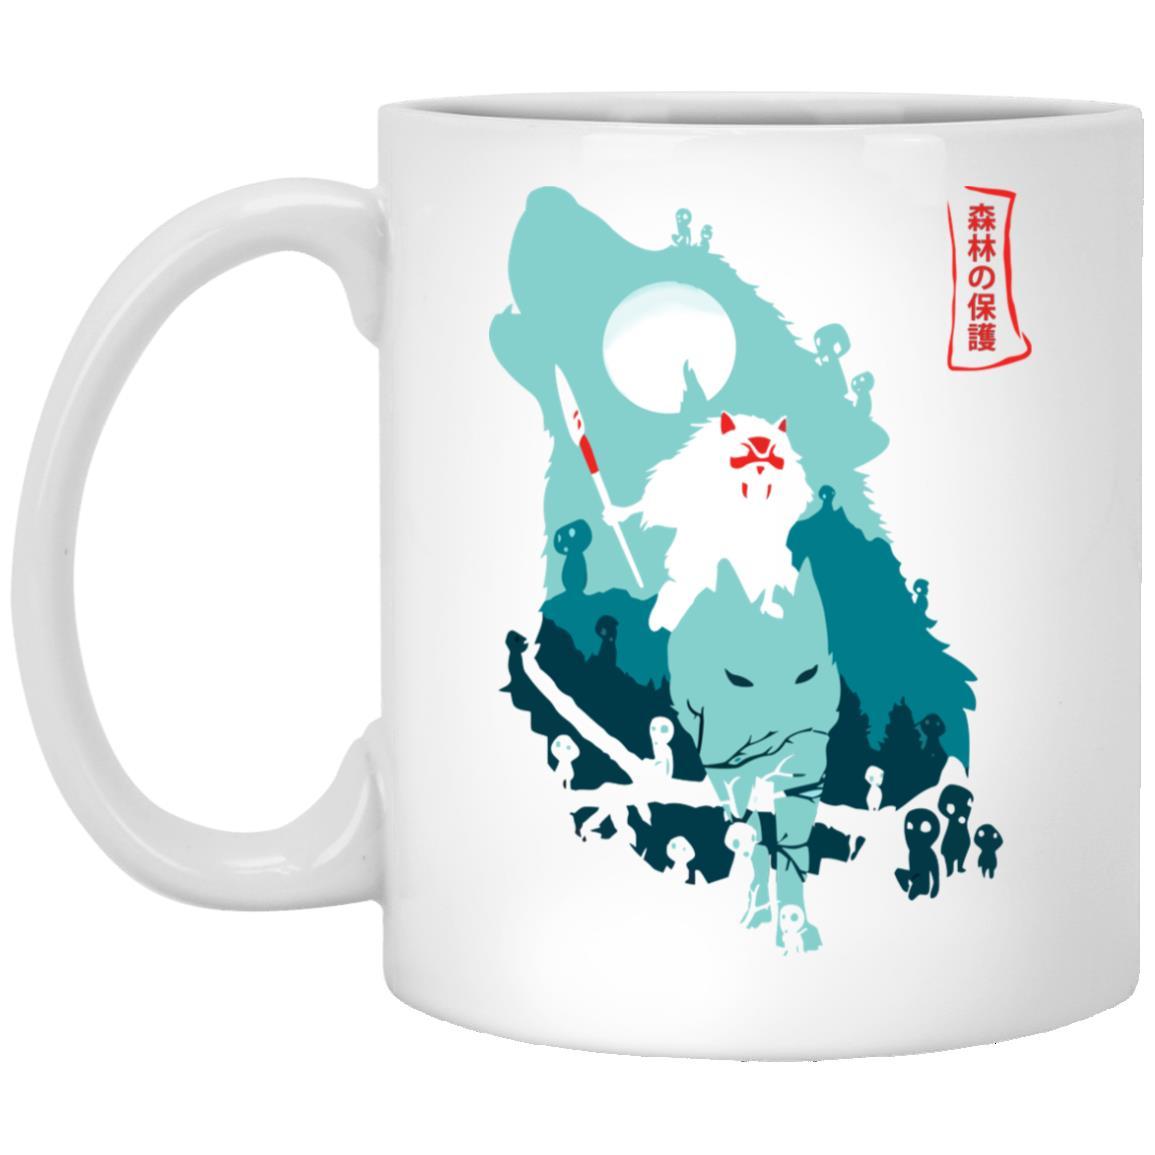 Princess Mononoke – Guardians of the Forest Mug